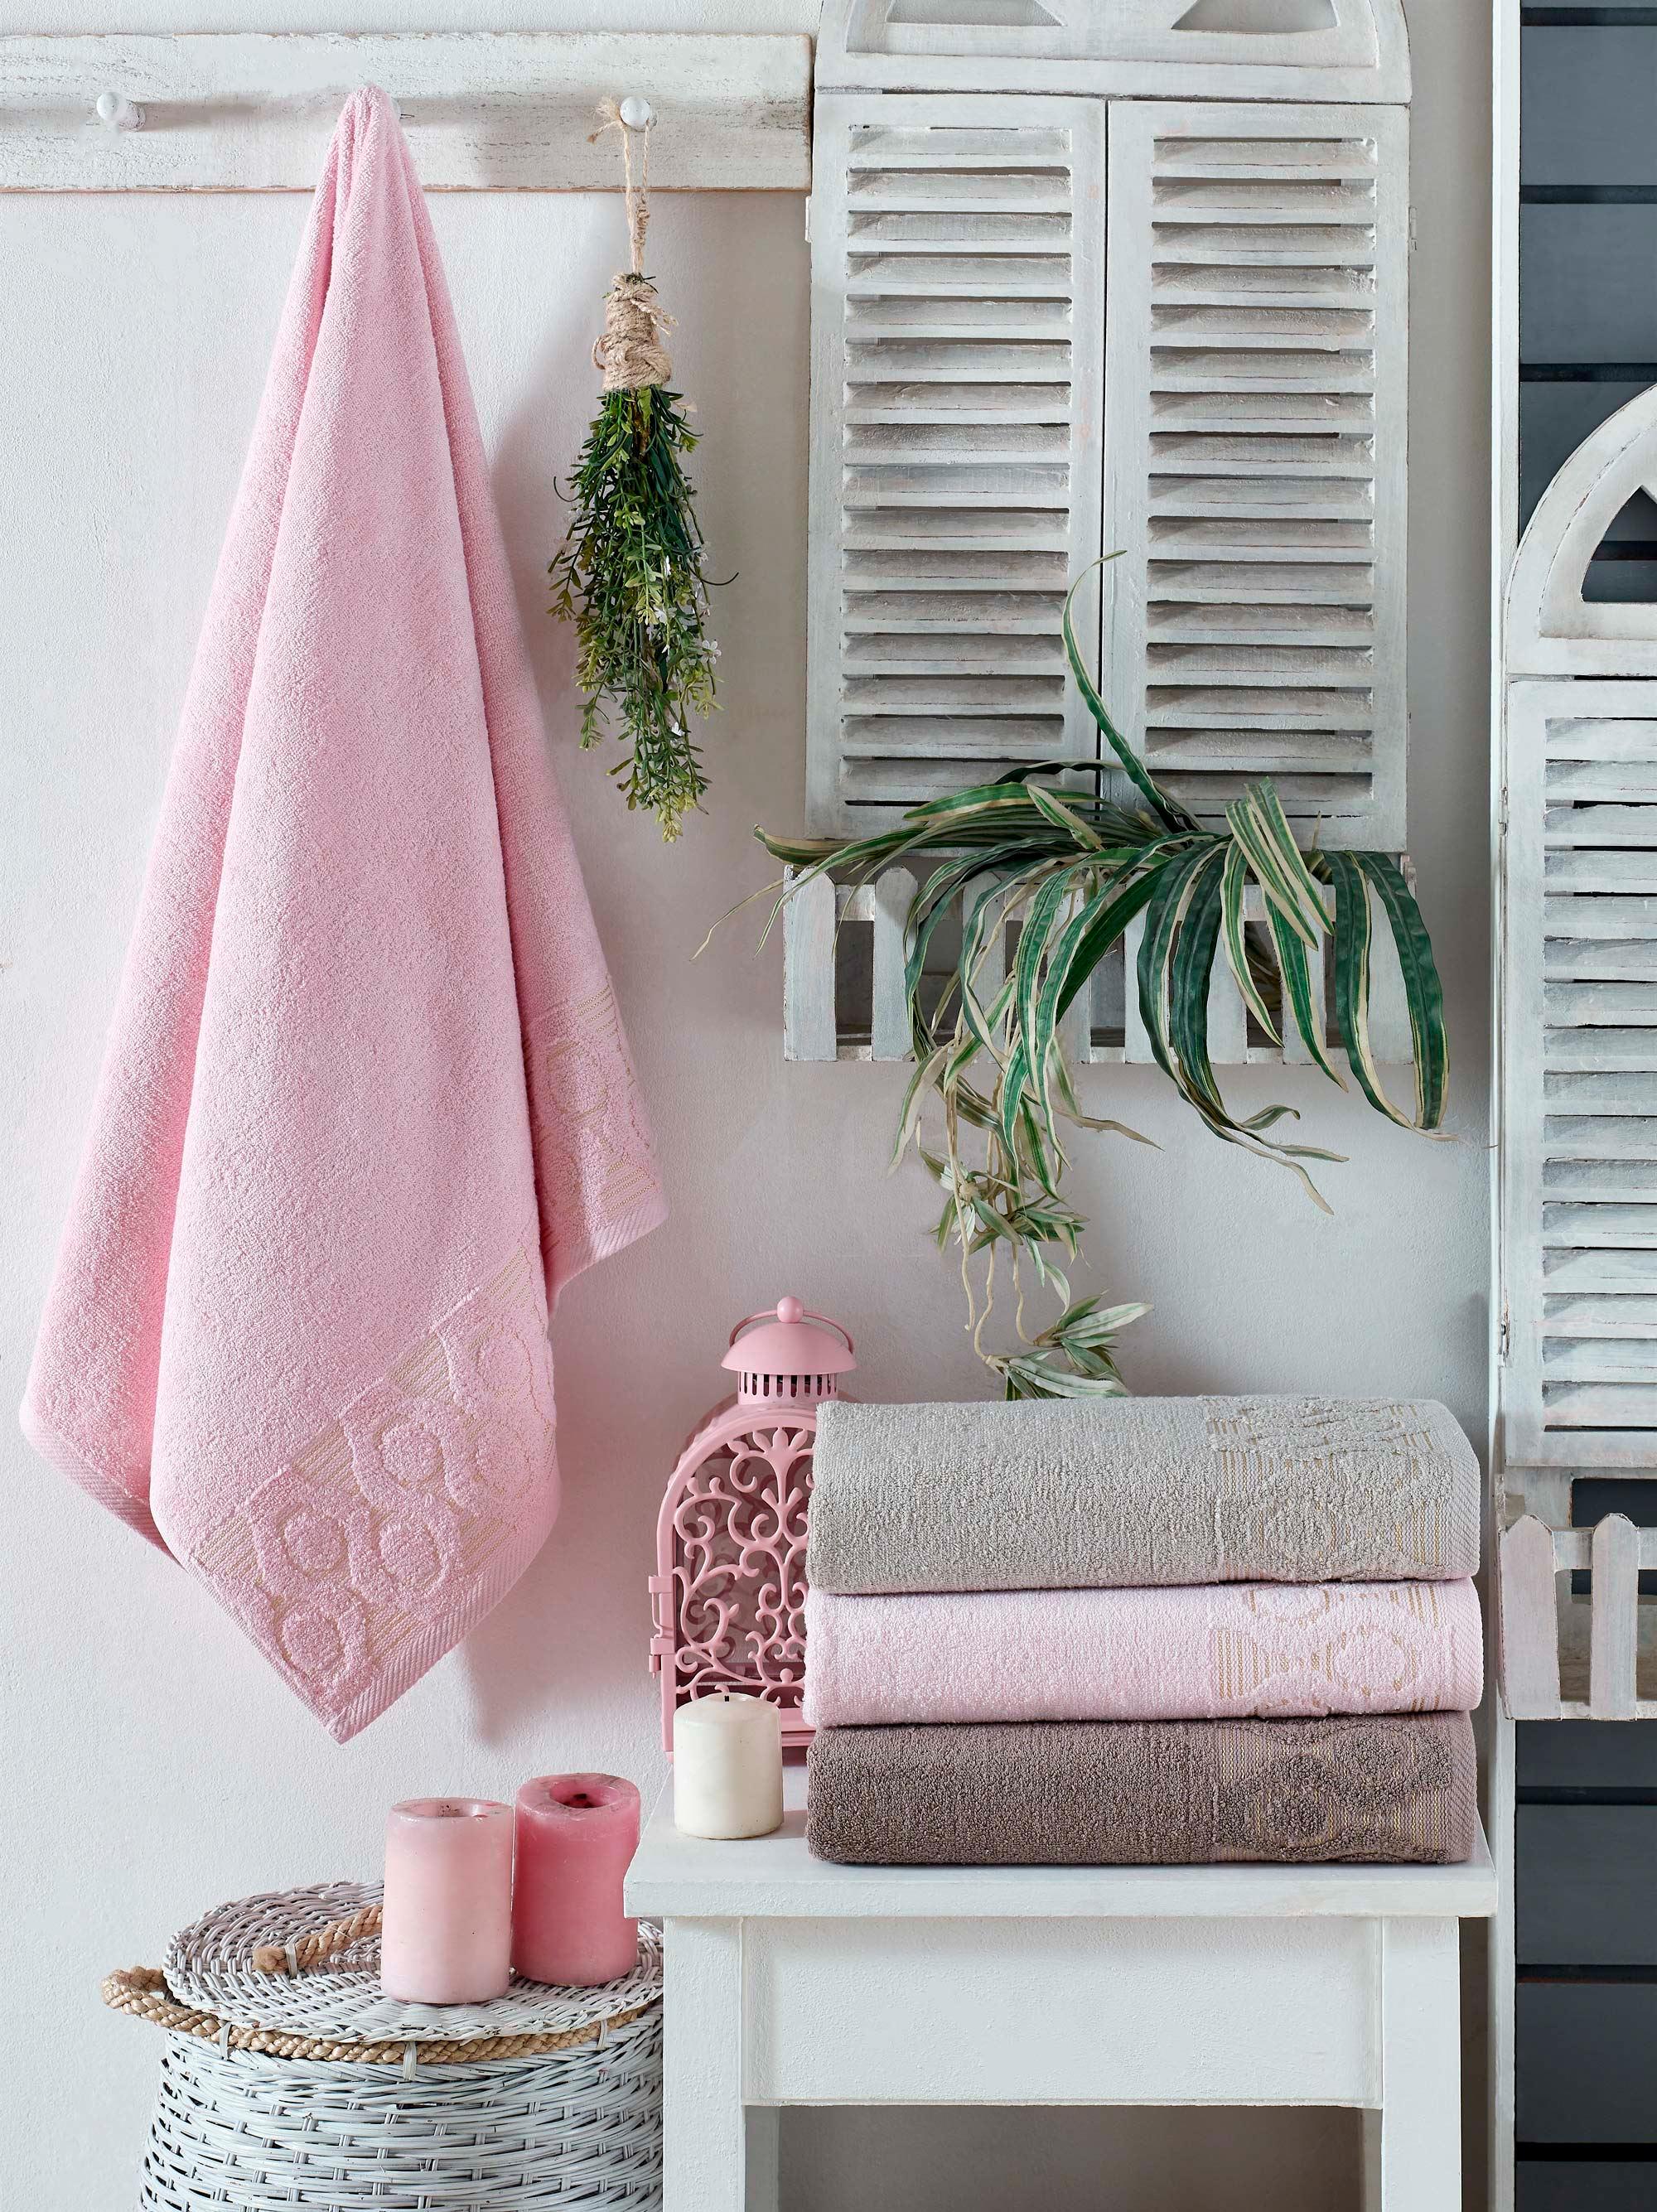 Купить Полотенца DO'n'CO, Полотенце Bonite (50х90 см - 4 шт), Турция, Кремовый, Розовый, Бамбук